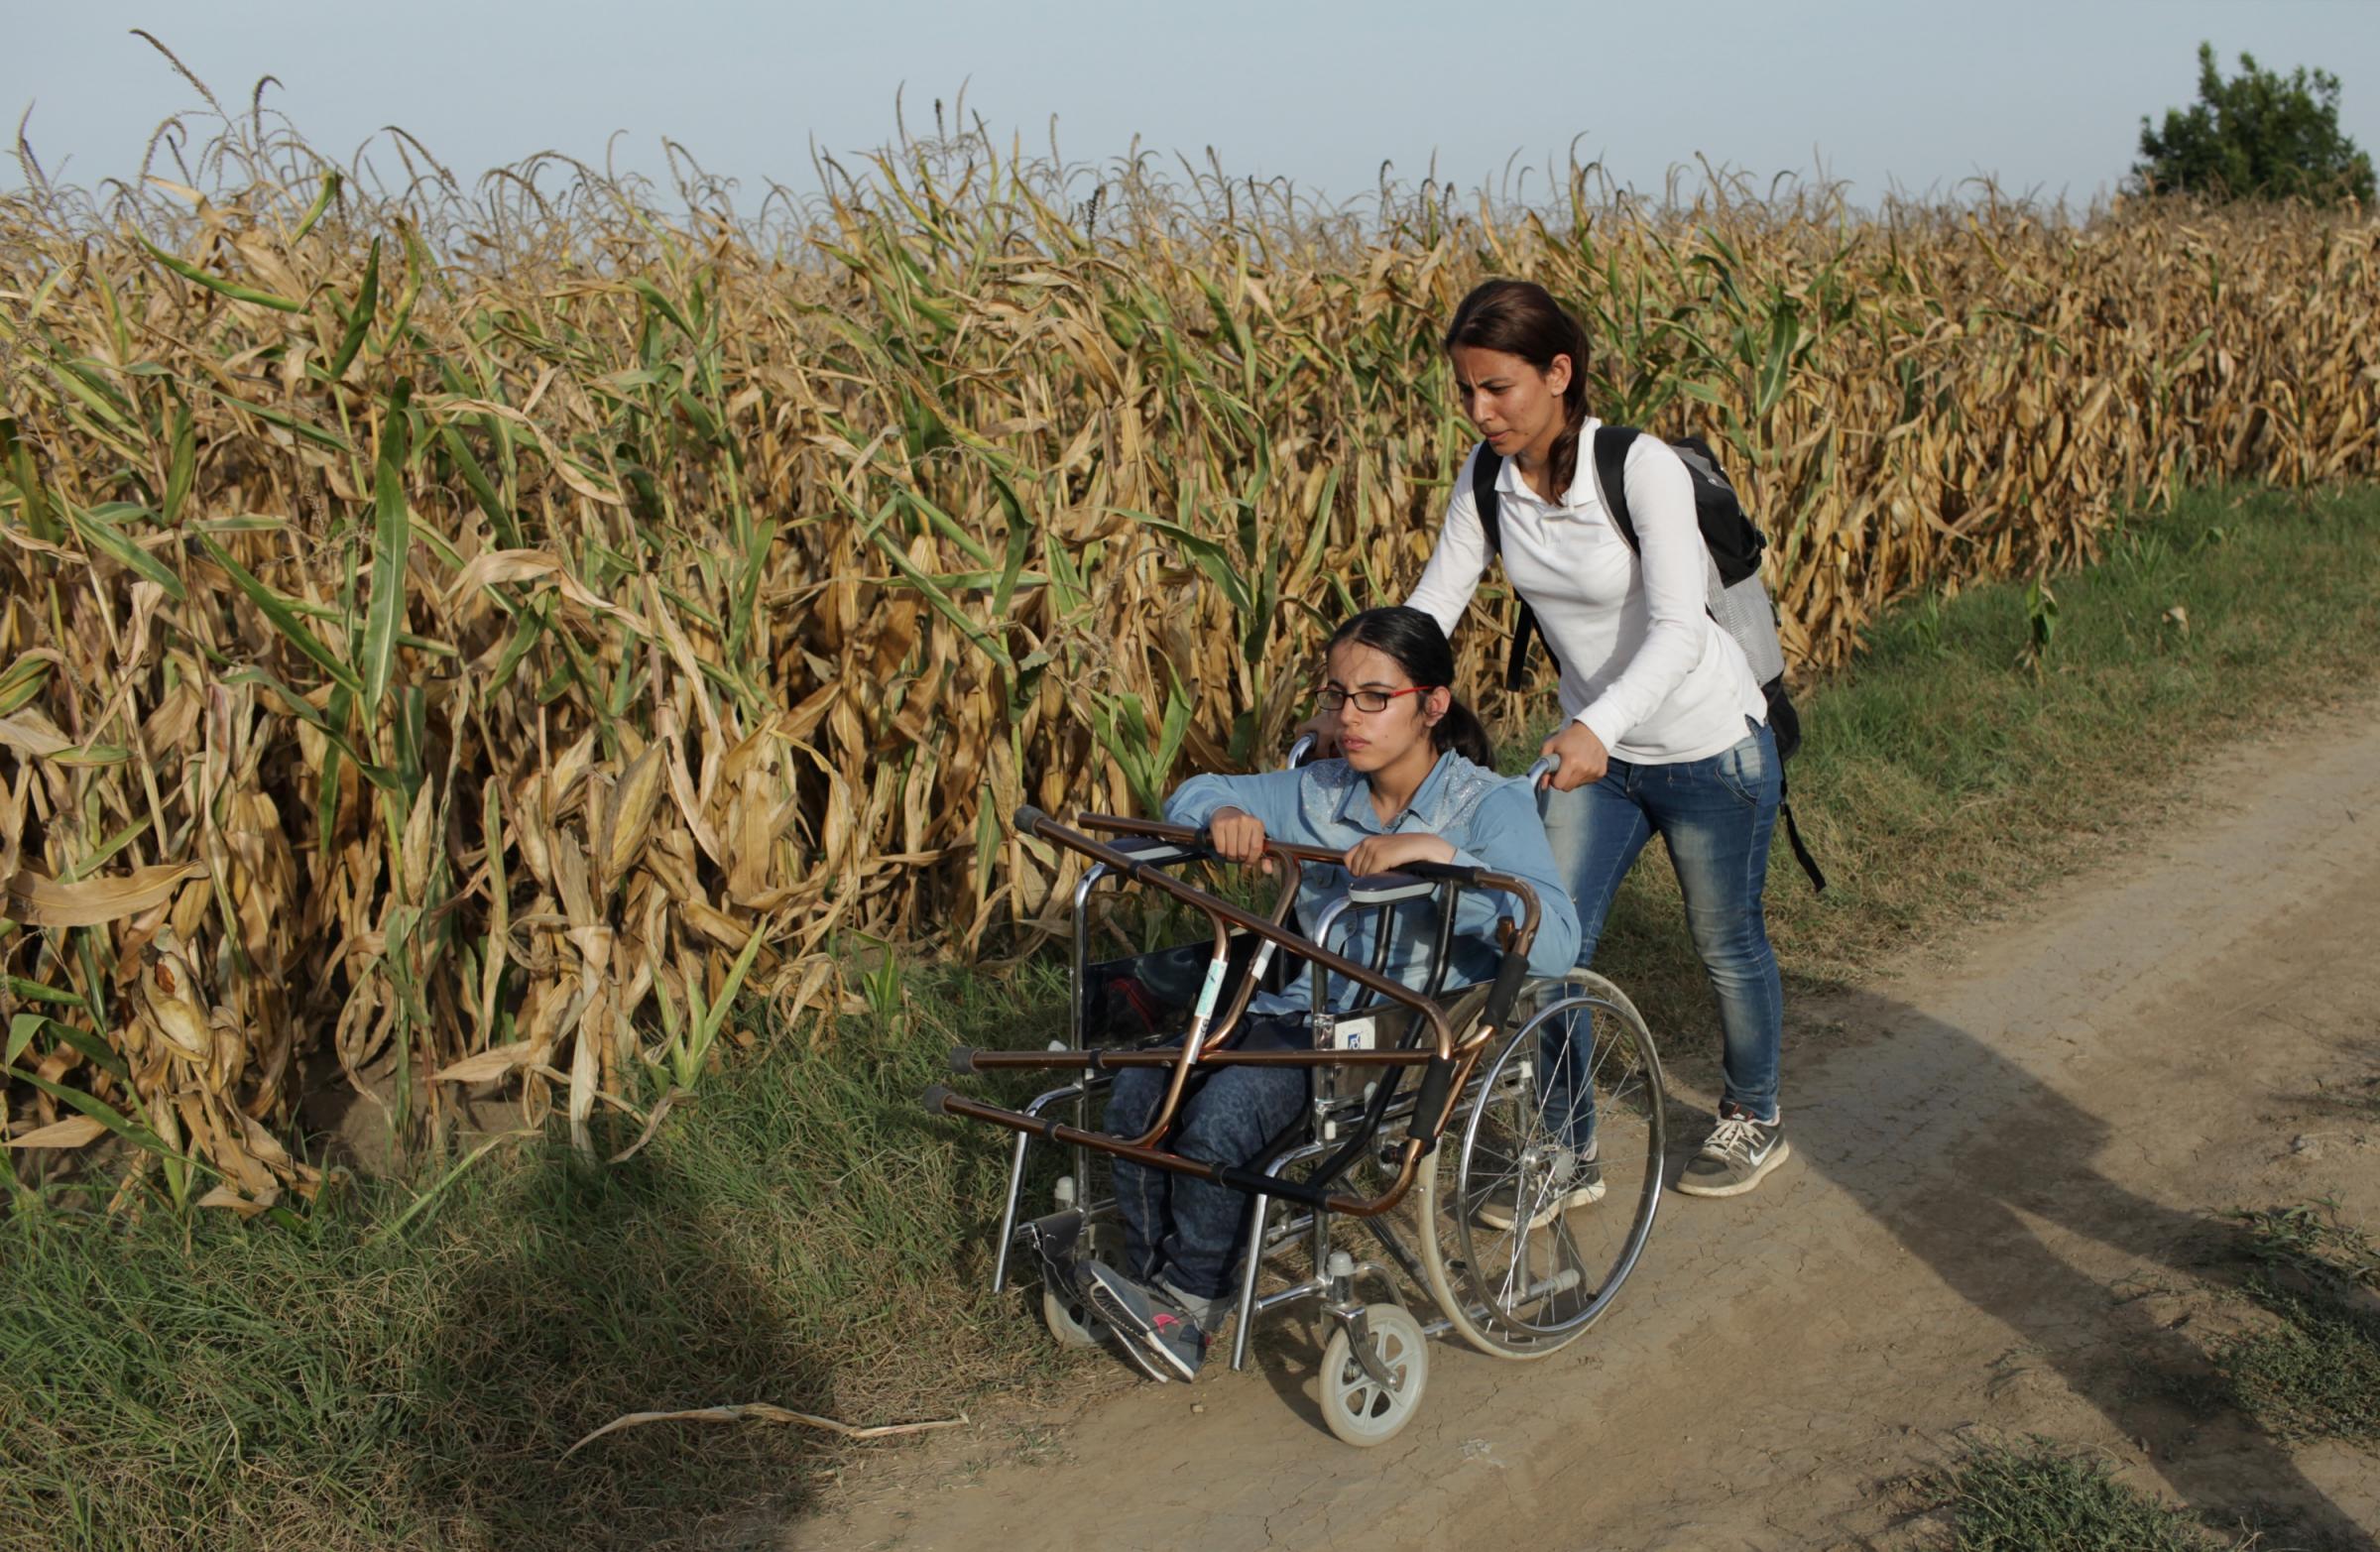 Sedie A Rotelle Roma : Sedia a rotelle roma sedia bimbi ikea immagini designo idea